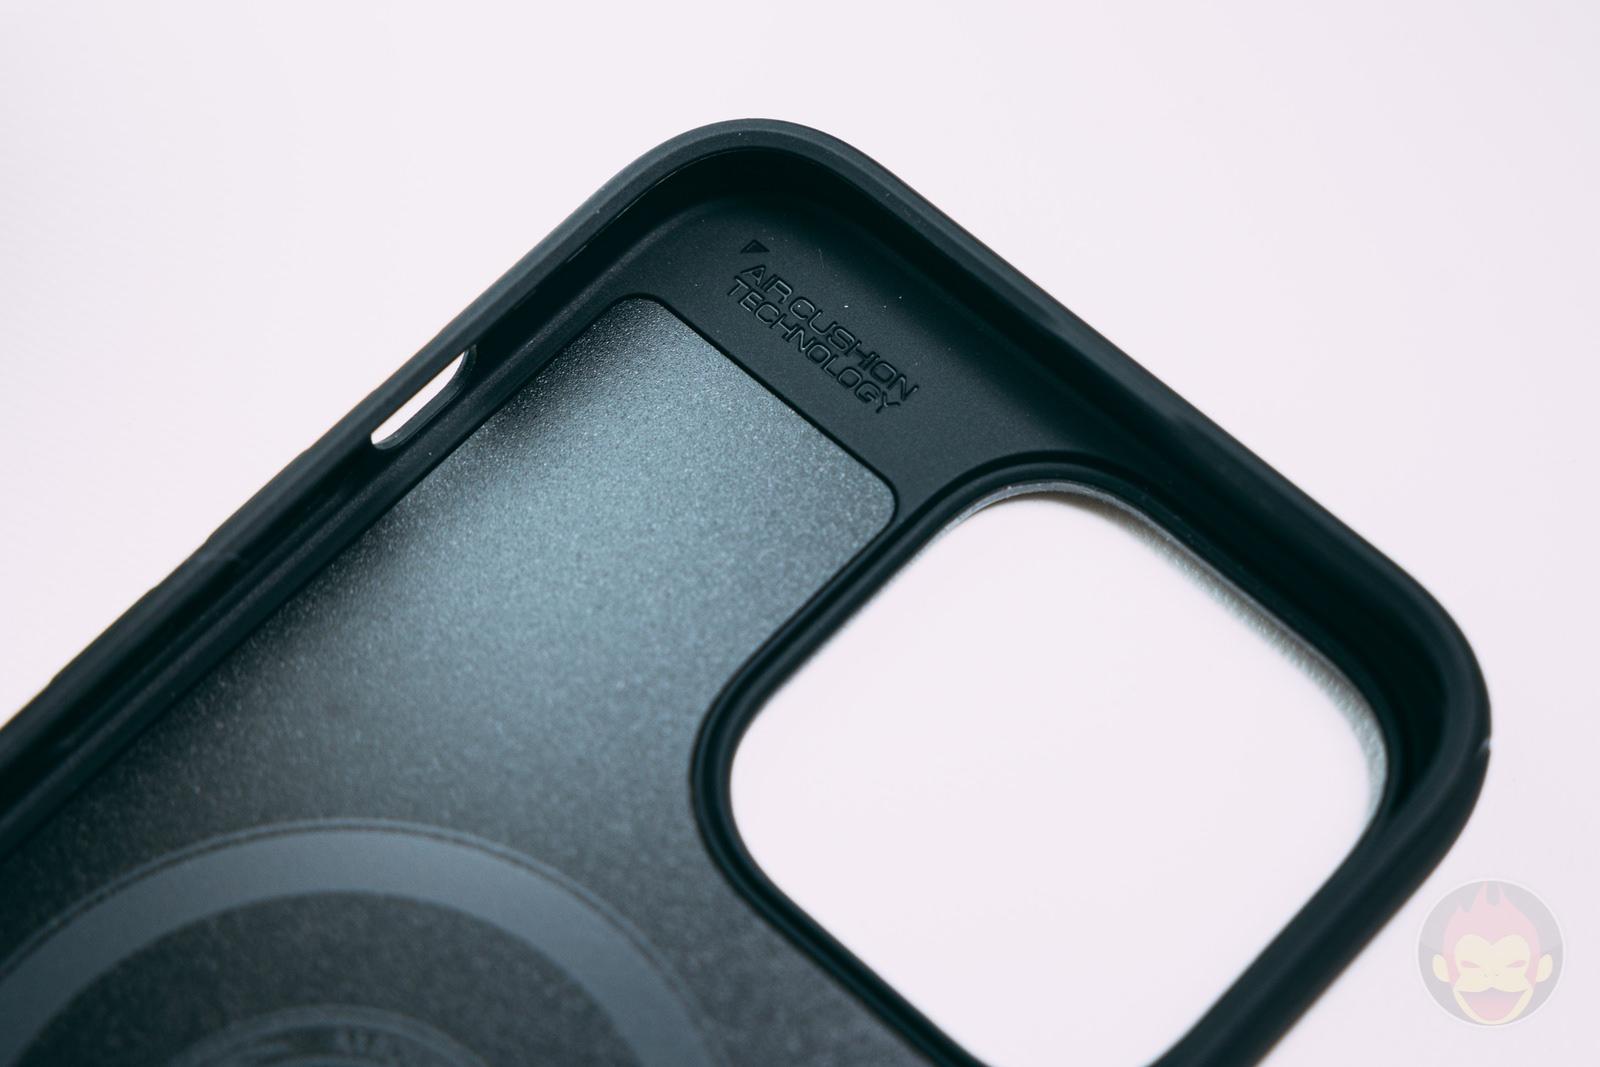 IPhone13 Spigen Mag Armour Review 05